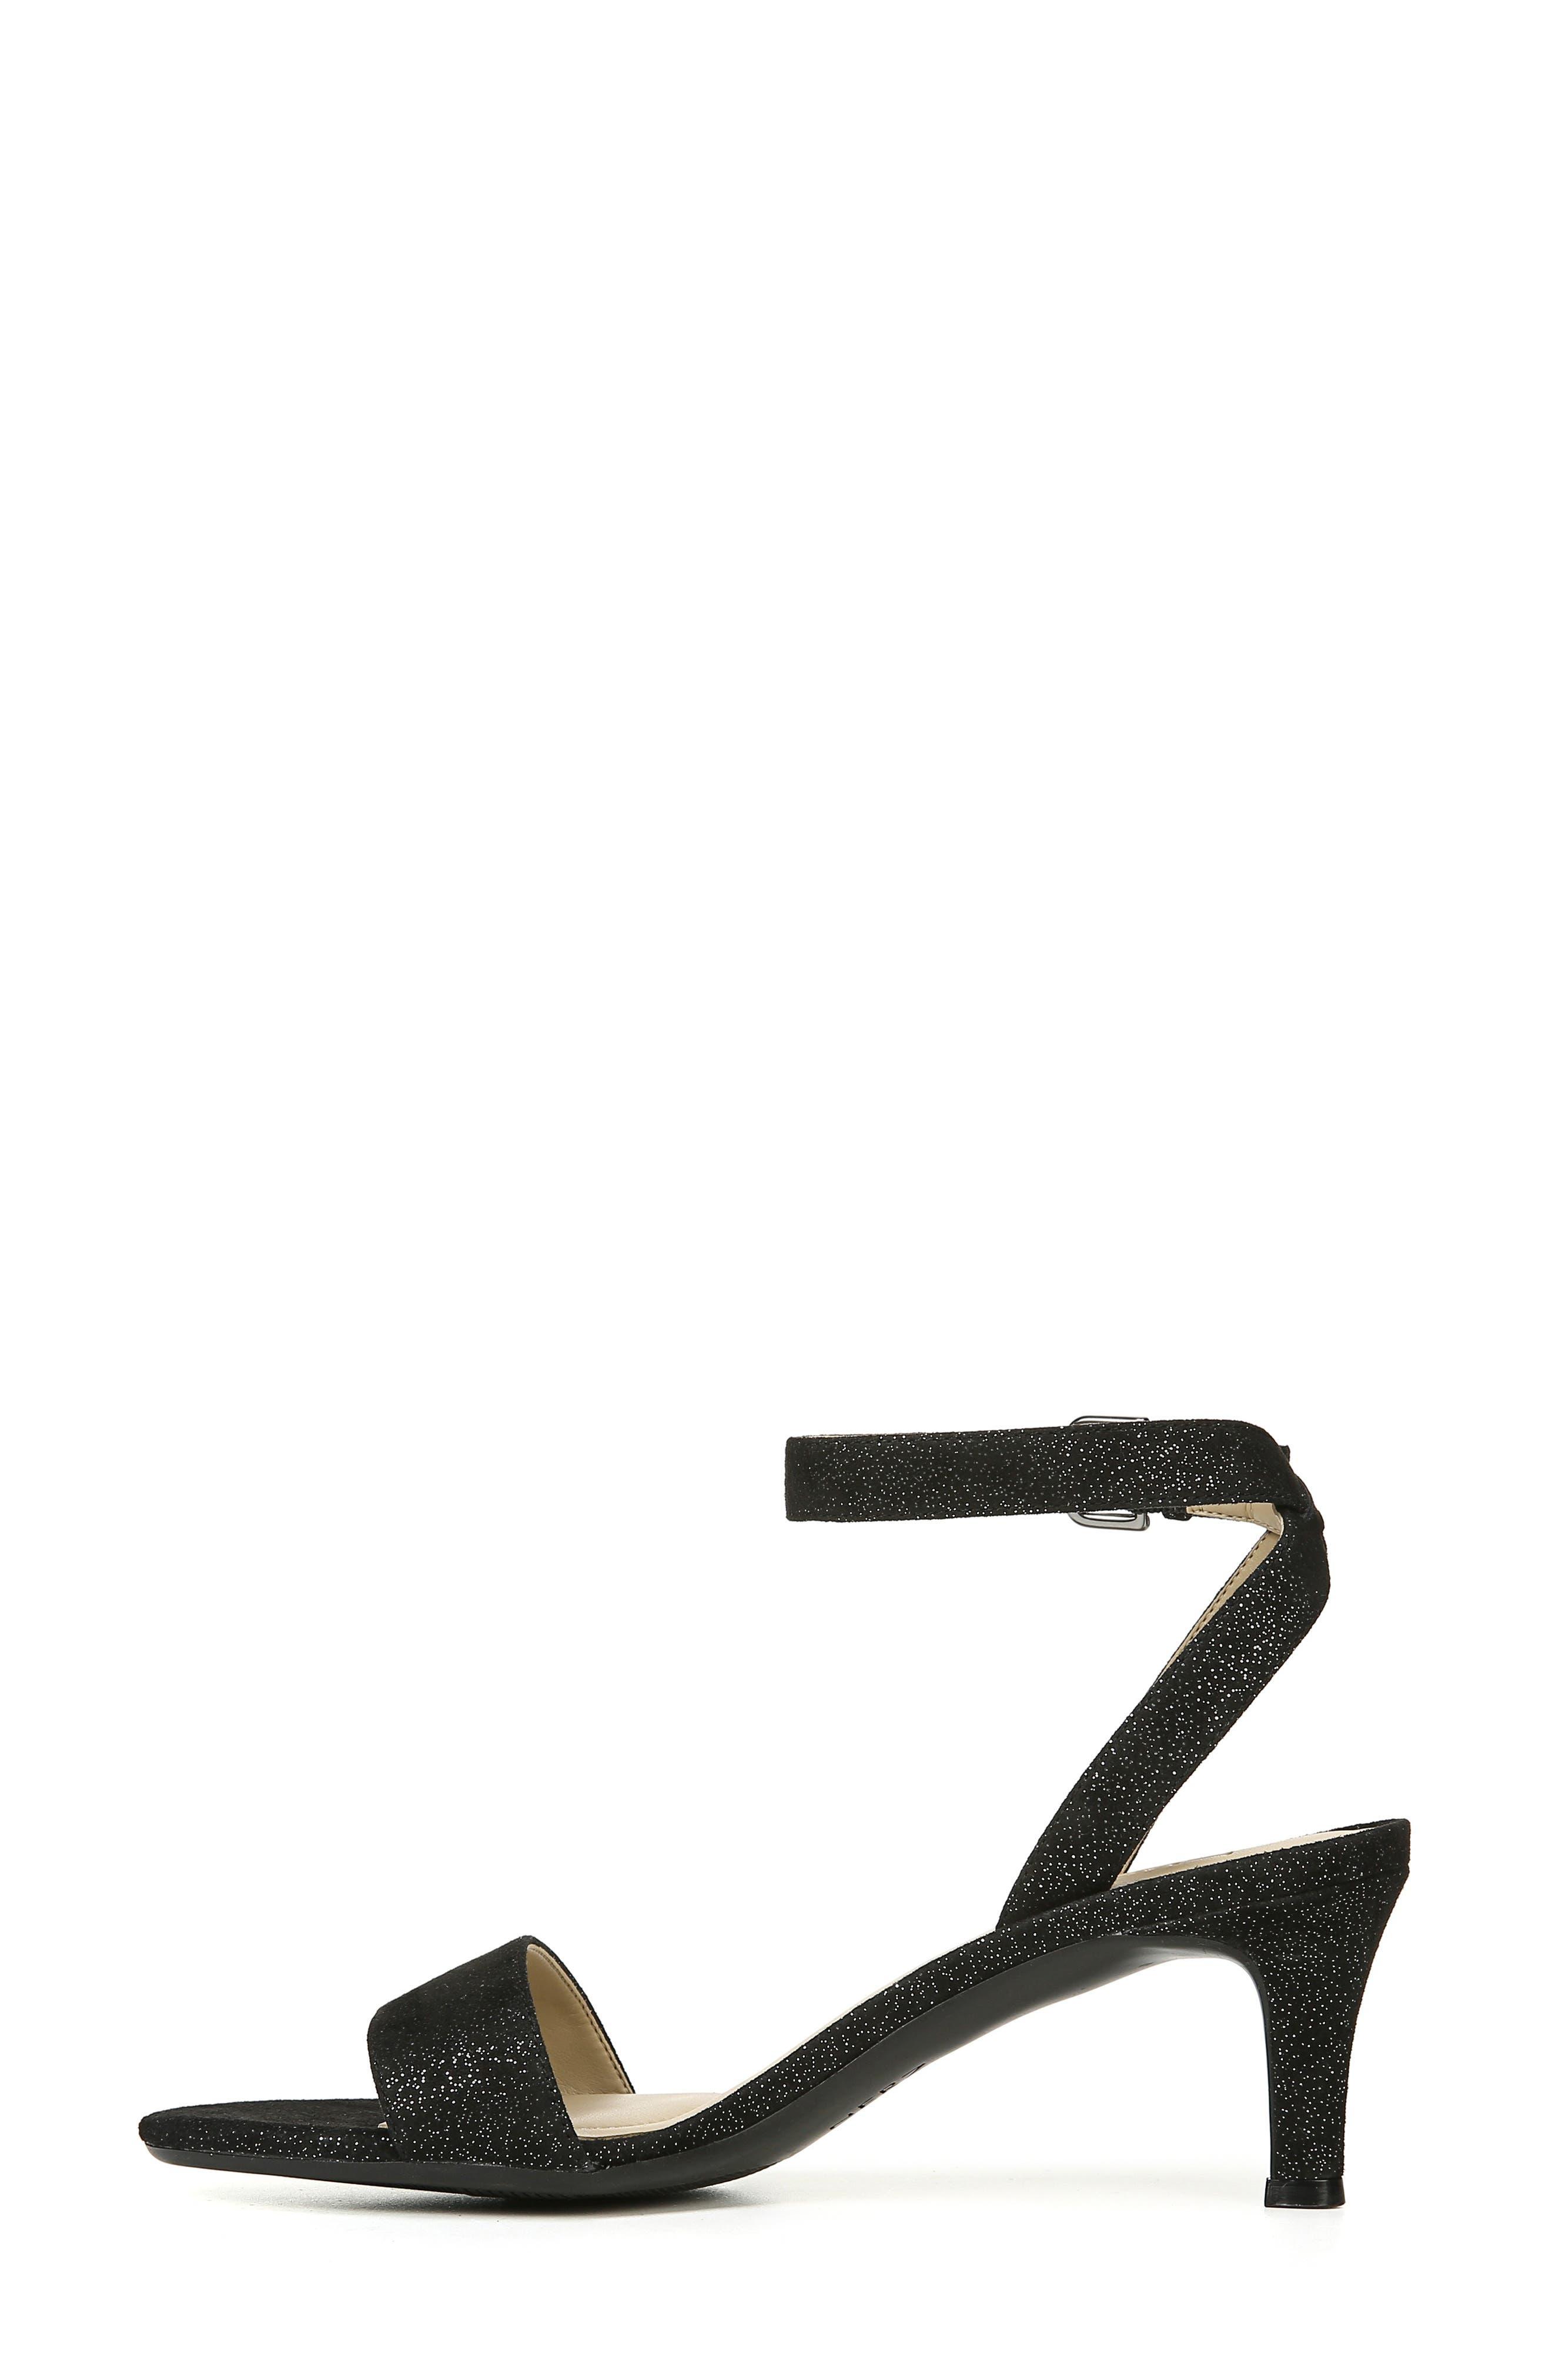 Tinda Sandal,                             Alternate thumbnail 8, color,                             BLACK GLITTER SUEDE